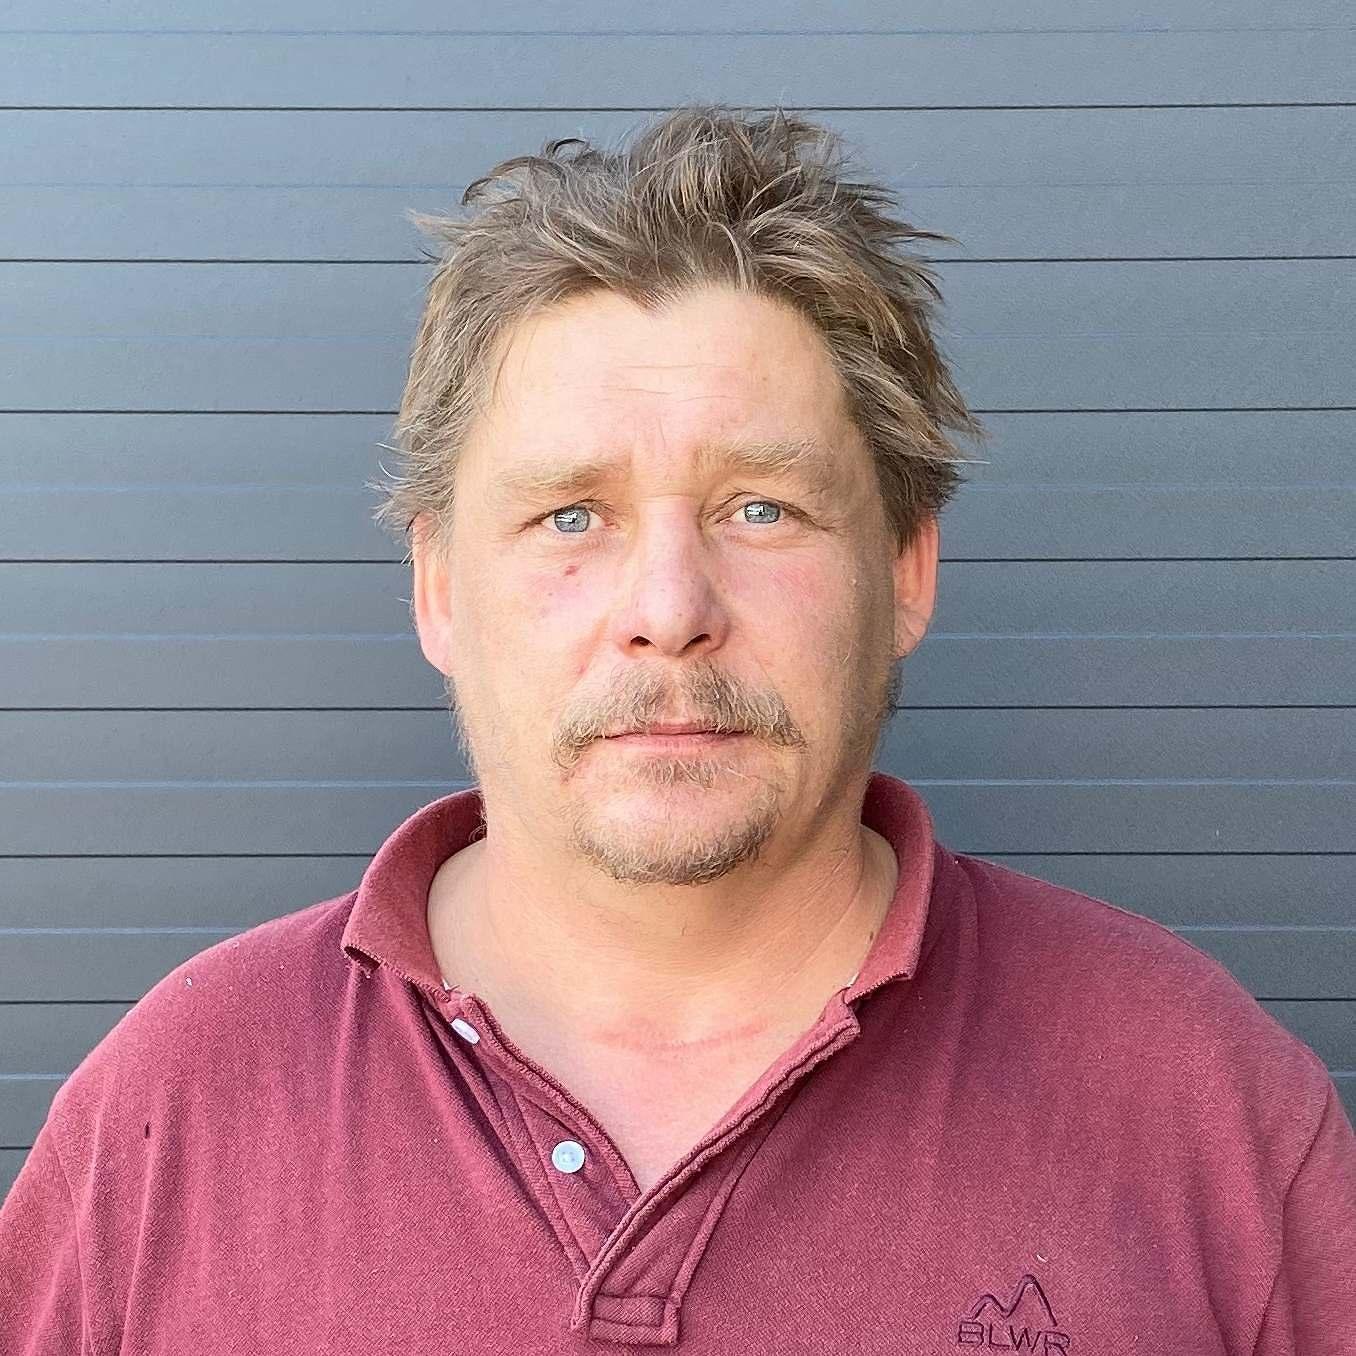 Johan Carlsson